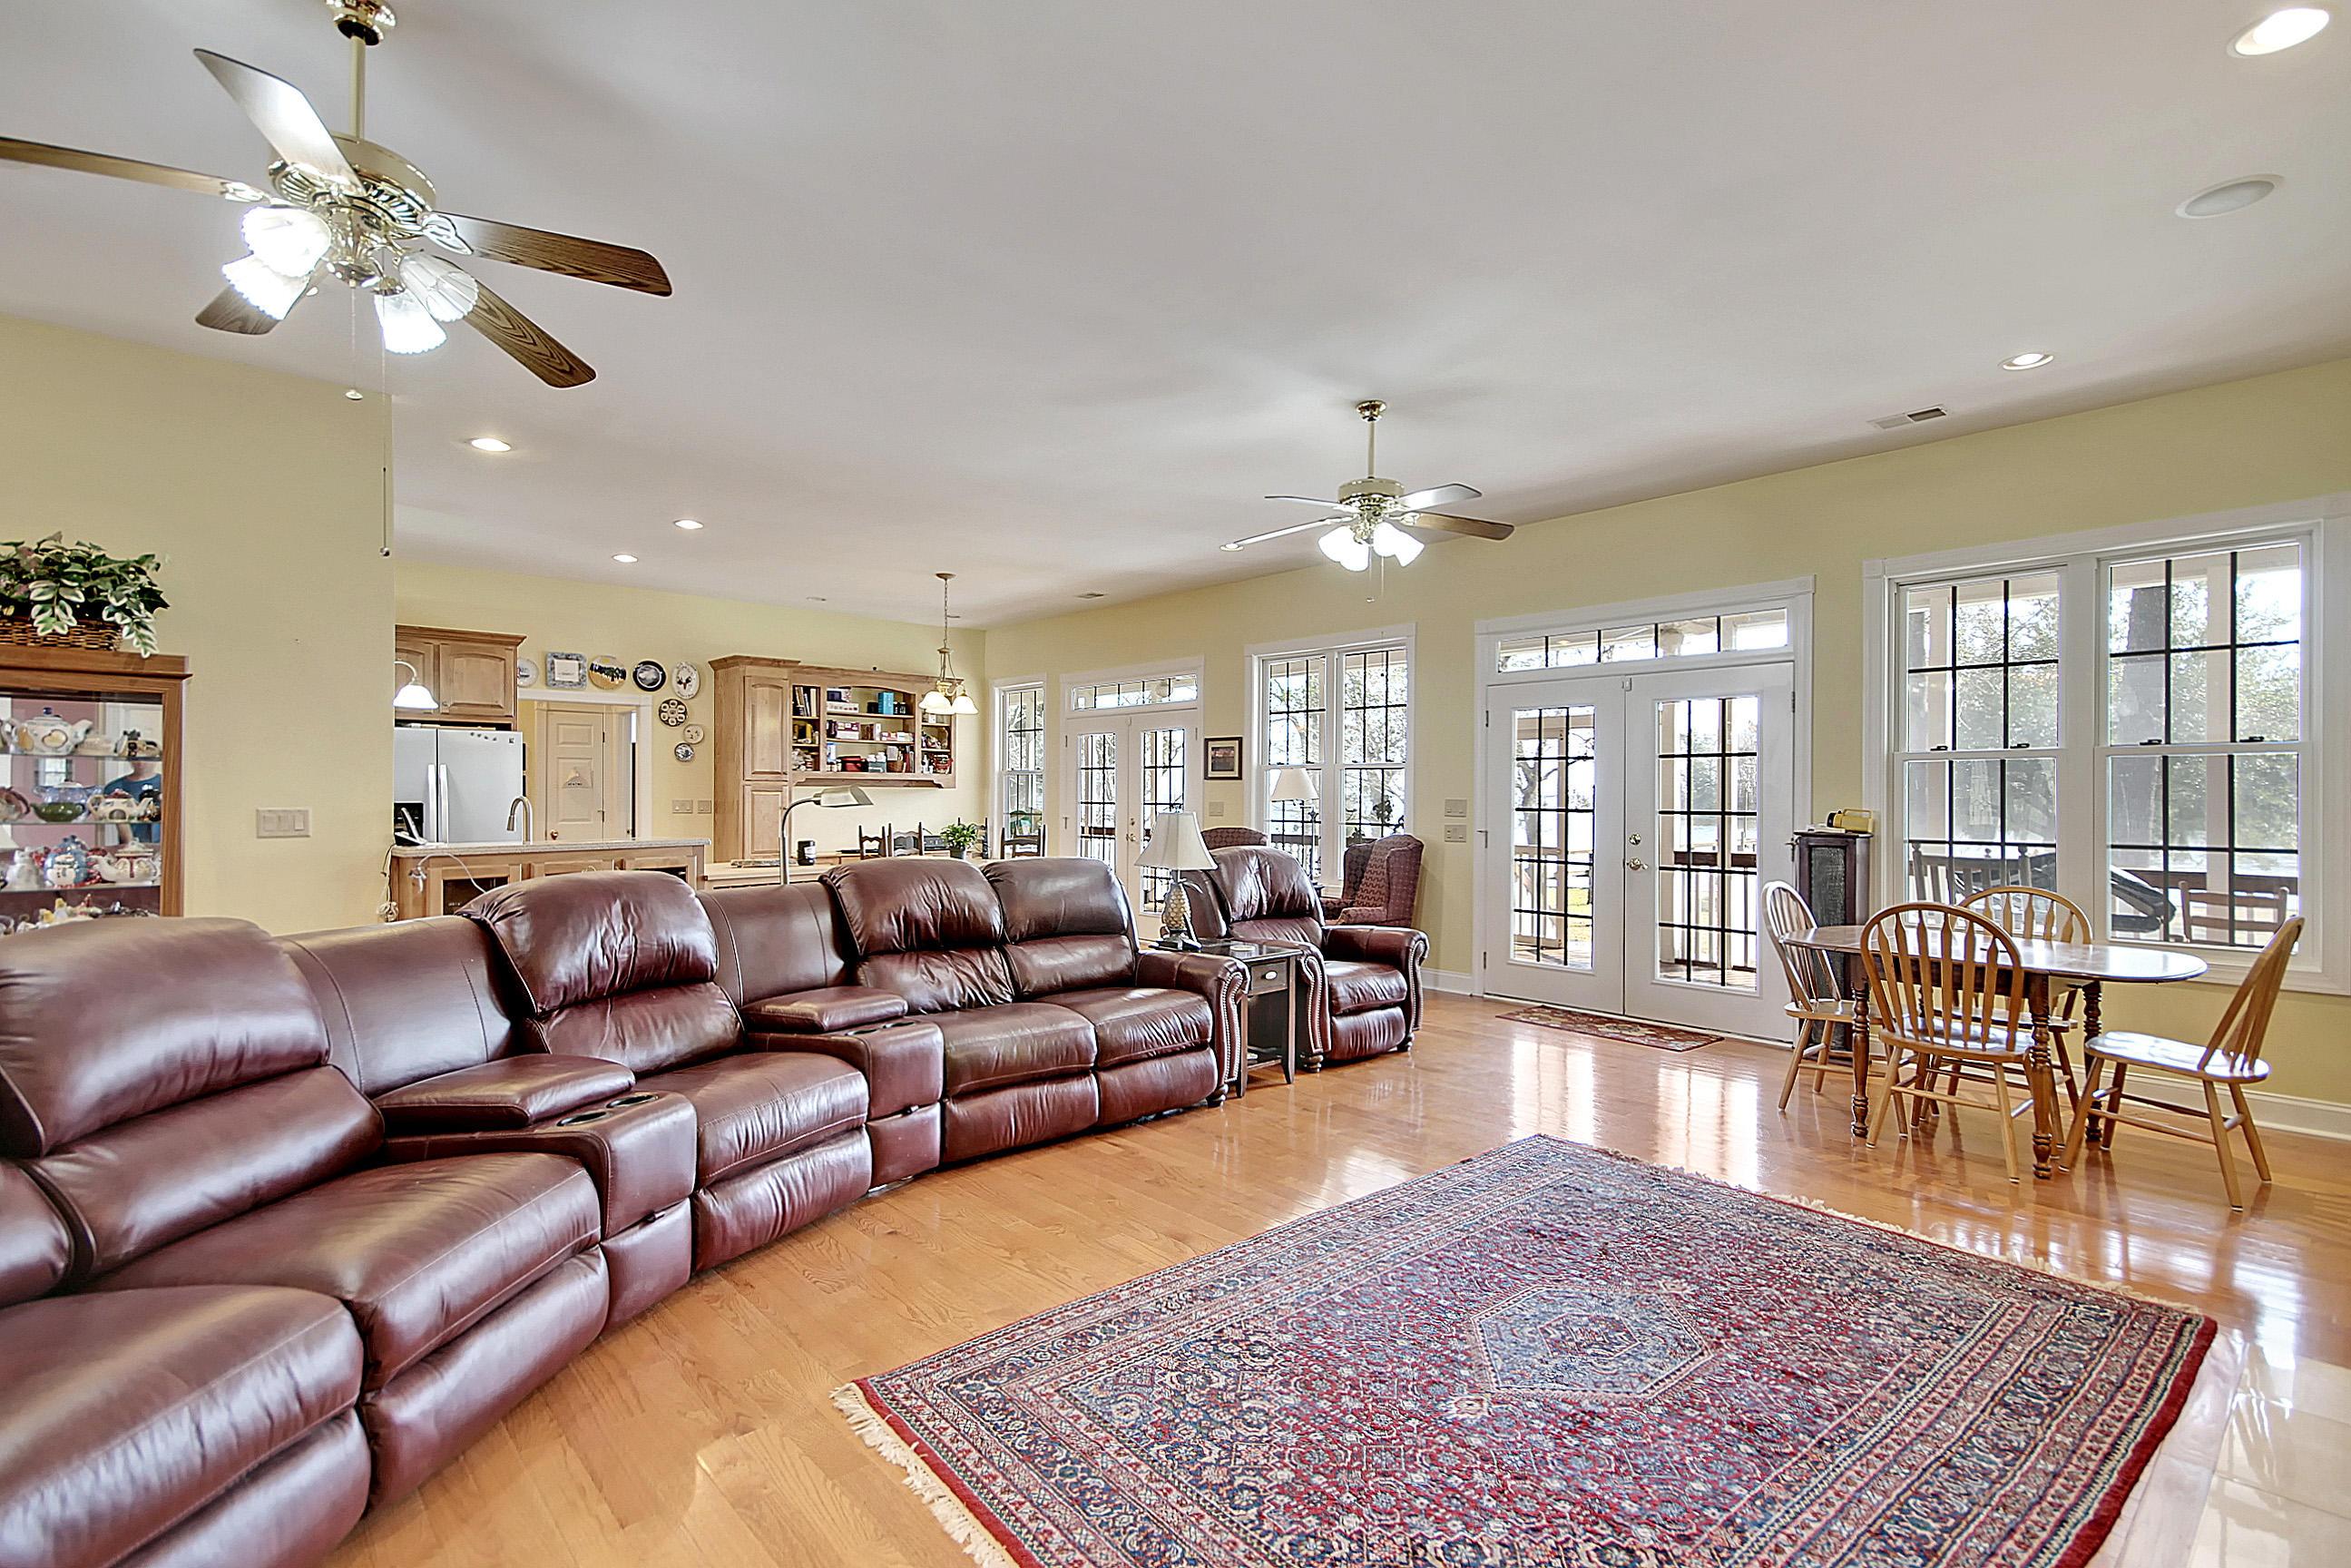 Cross Subd (Longpoint) Homes For Sale - 1191 Longpoint, Cross, SC - 15